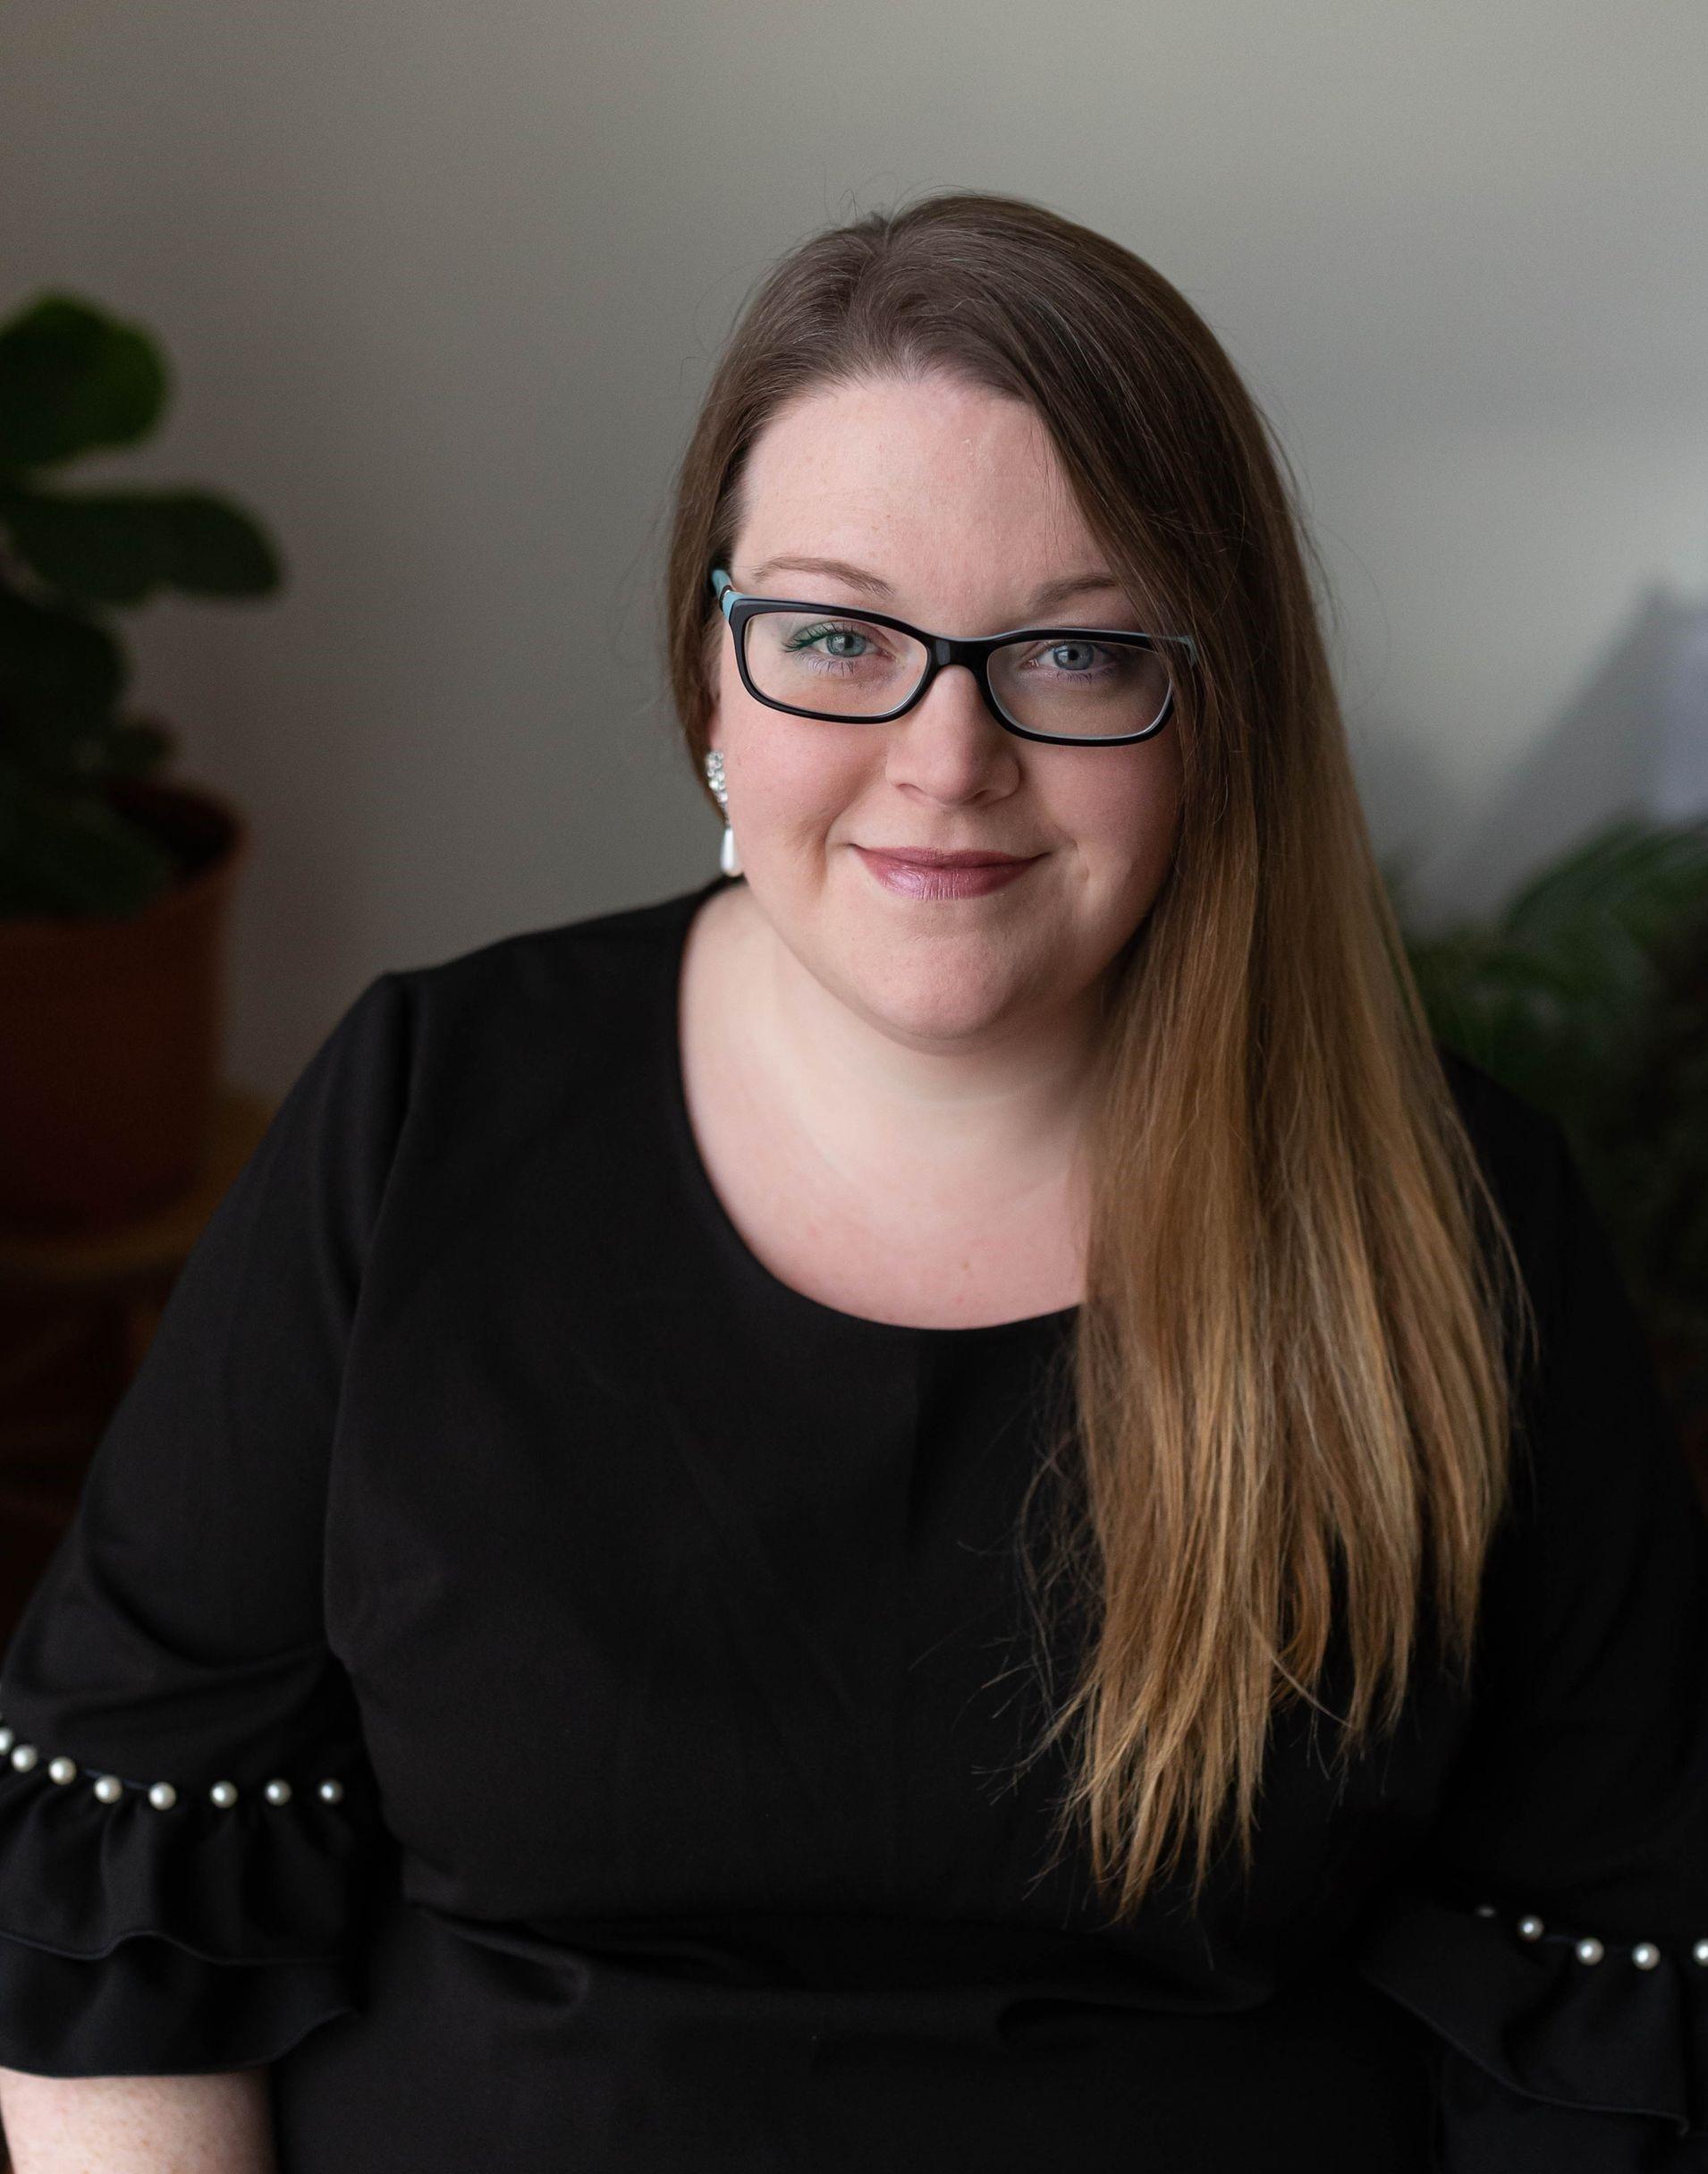 Megan_Bowman_Executive_Director_South_High